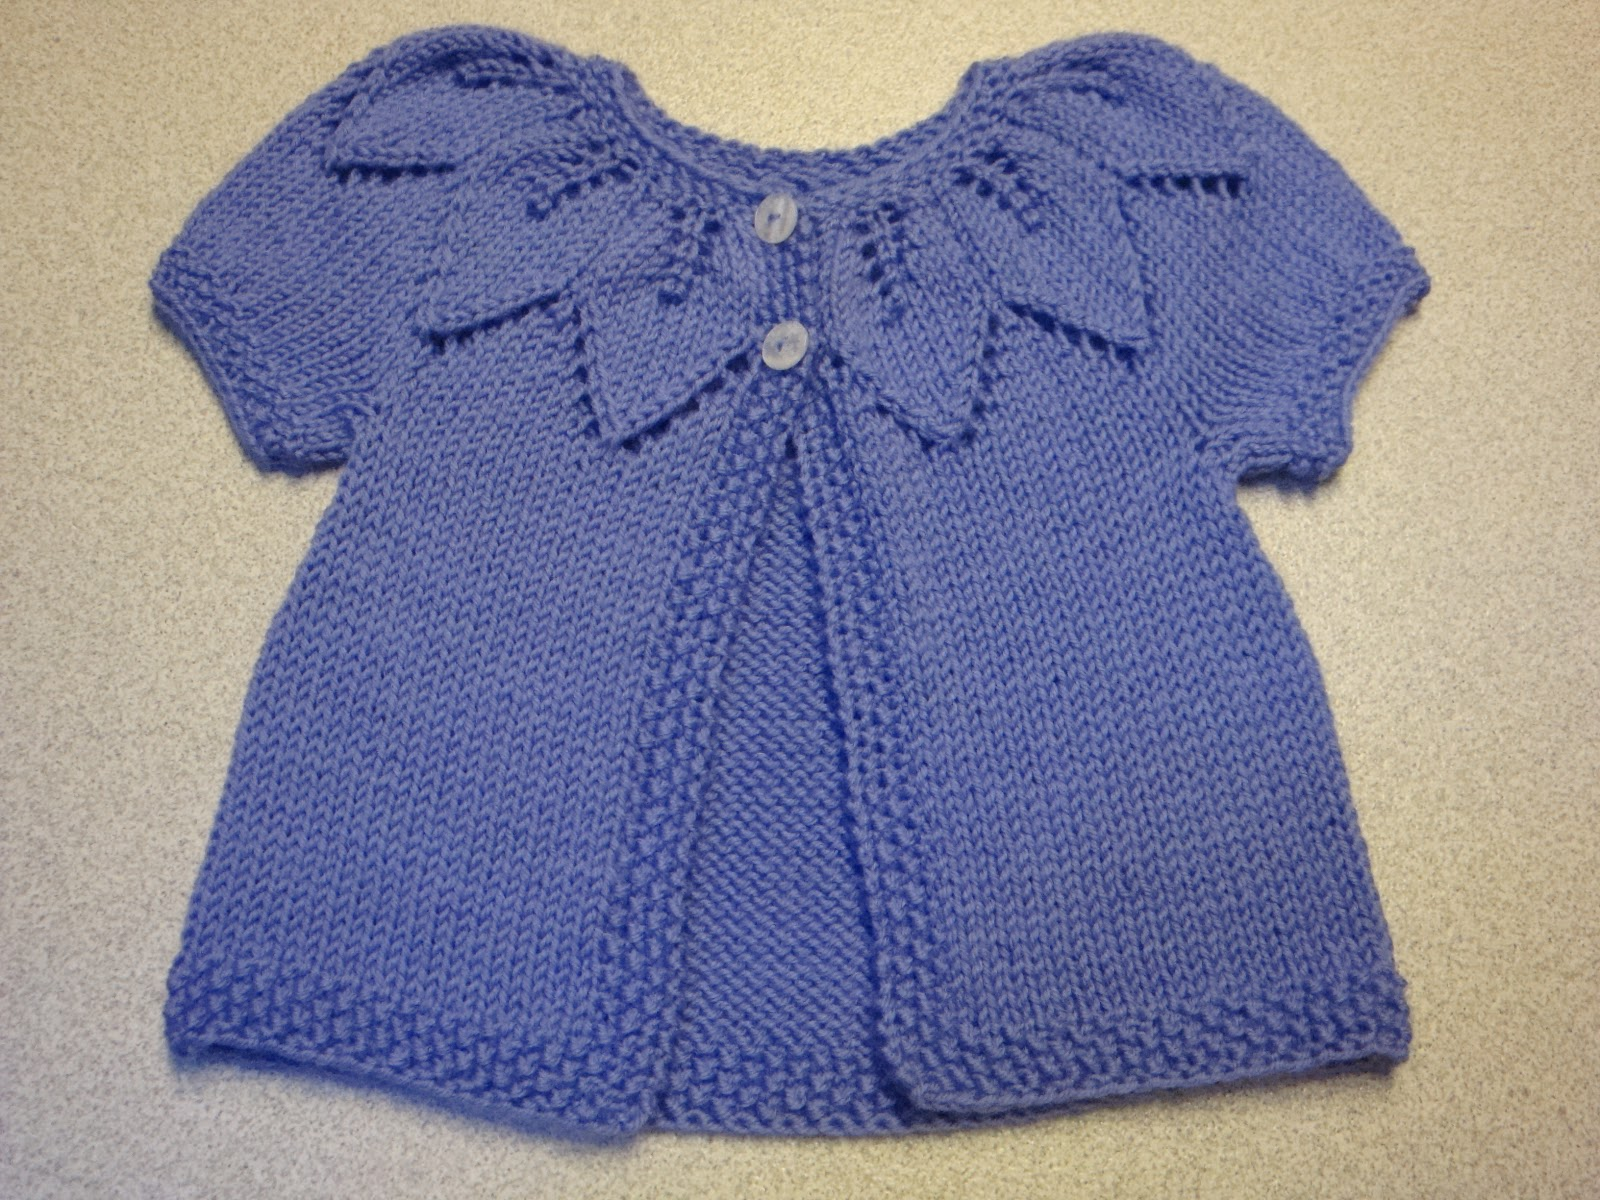 db1774918c0f Kim s Knitting Korner  Lavender Leaves  A sweet sweater for Baby ...